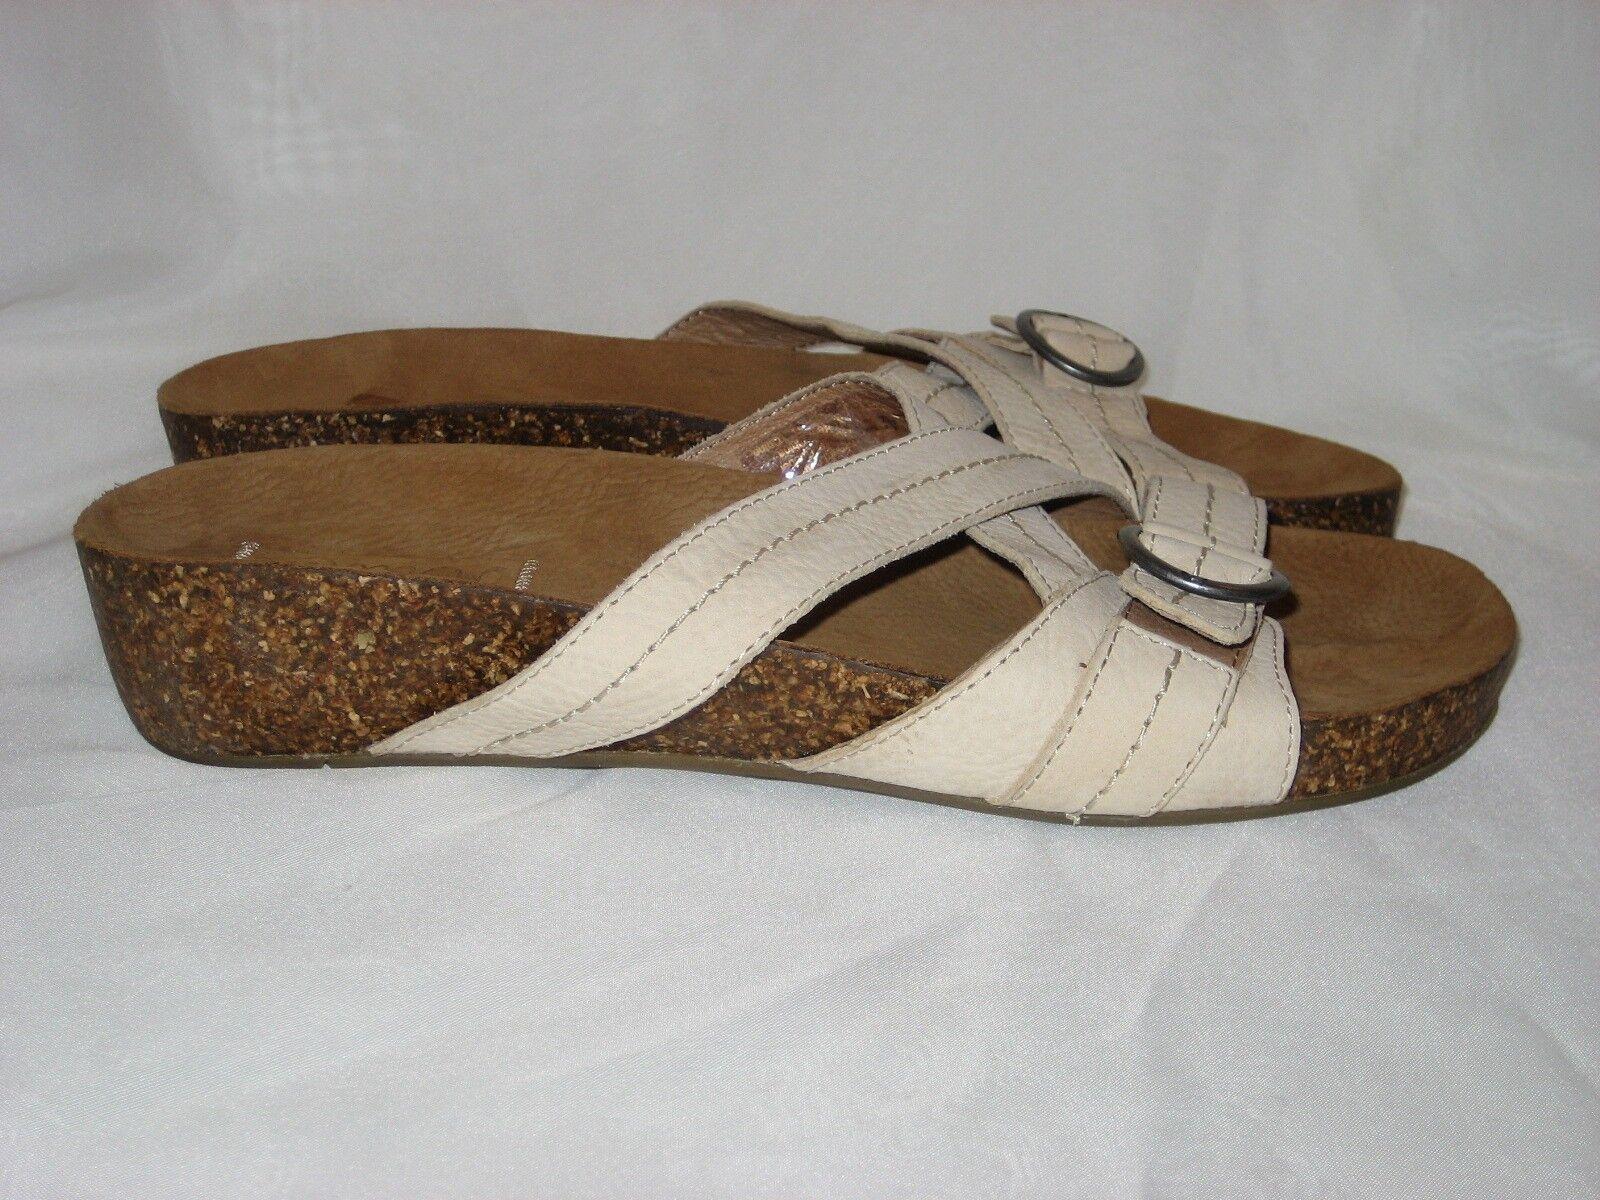 OLUKAI Tan Leder Strap Sandale (Sample) Größe 7M NEW